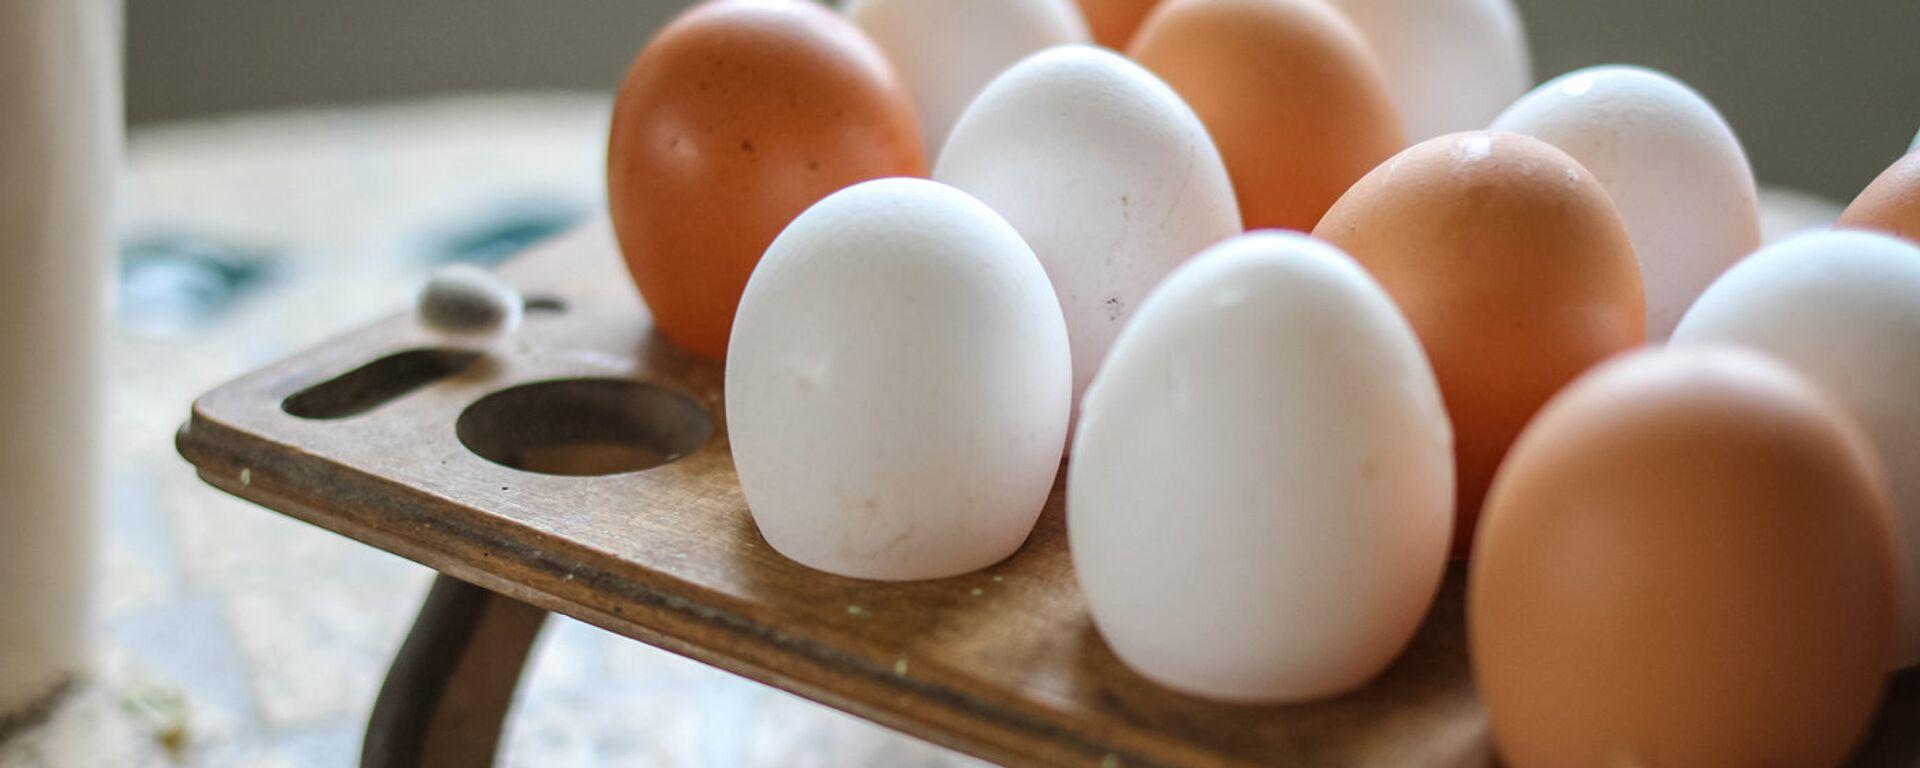 Яйца - Sputnik Латвия, 1920, 01.04.2021